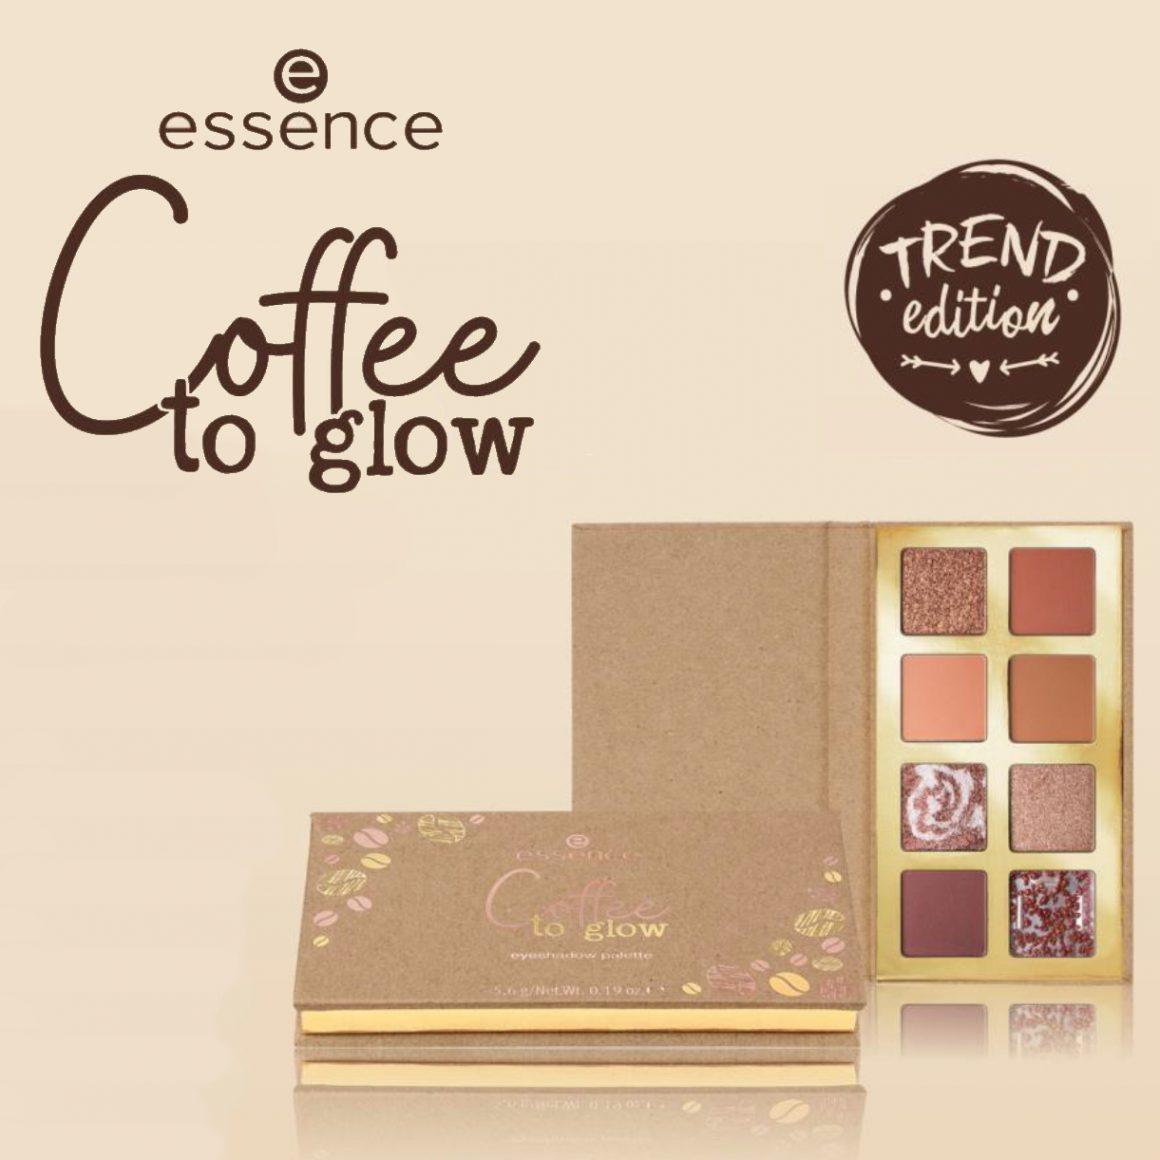 Persbericht: Essence LE Coffee To Glow